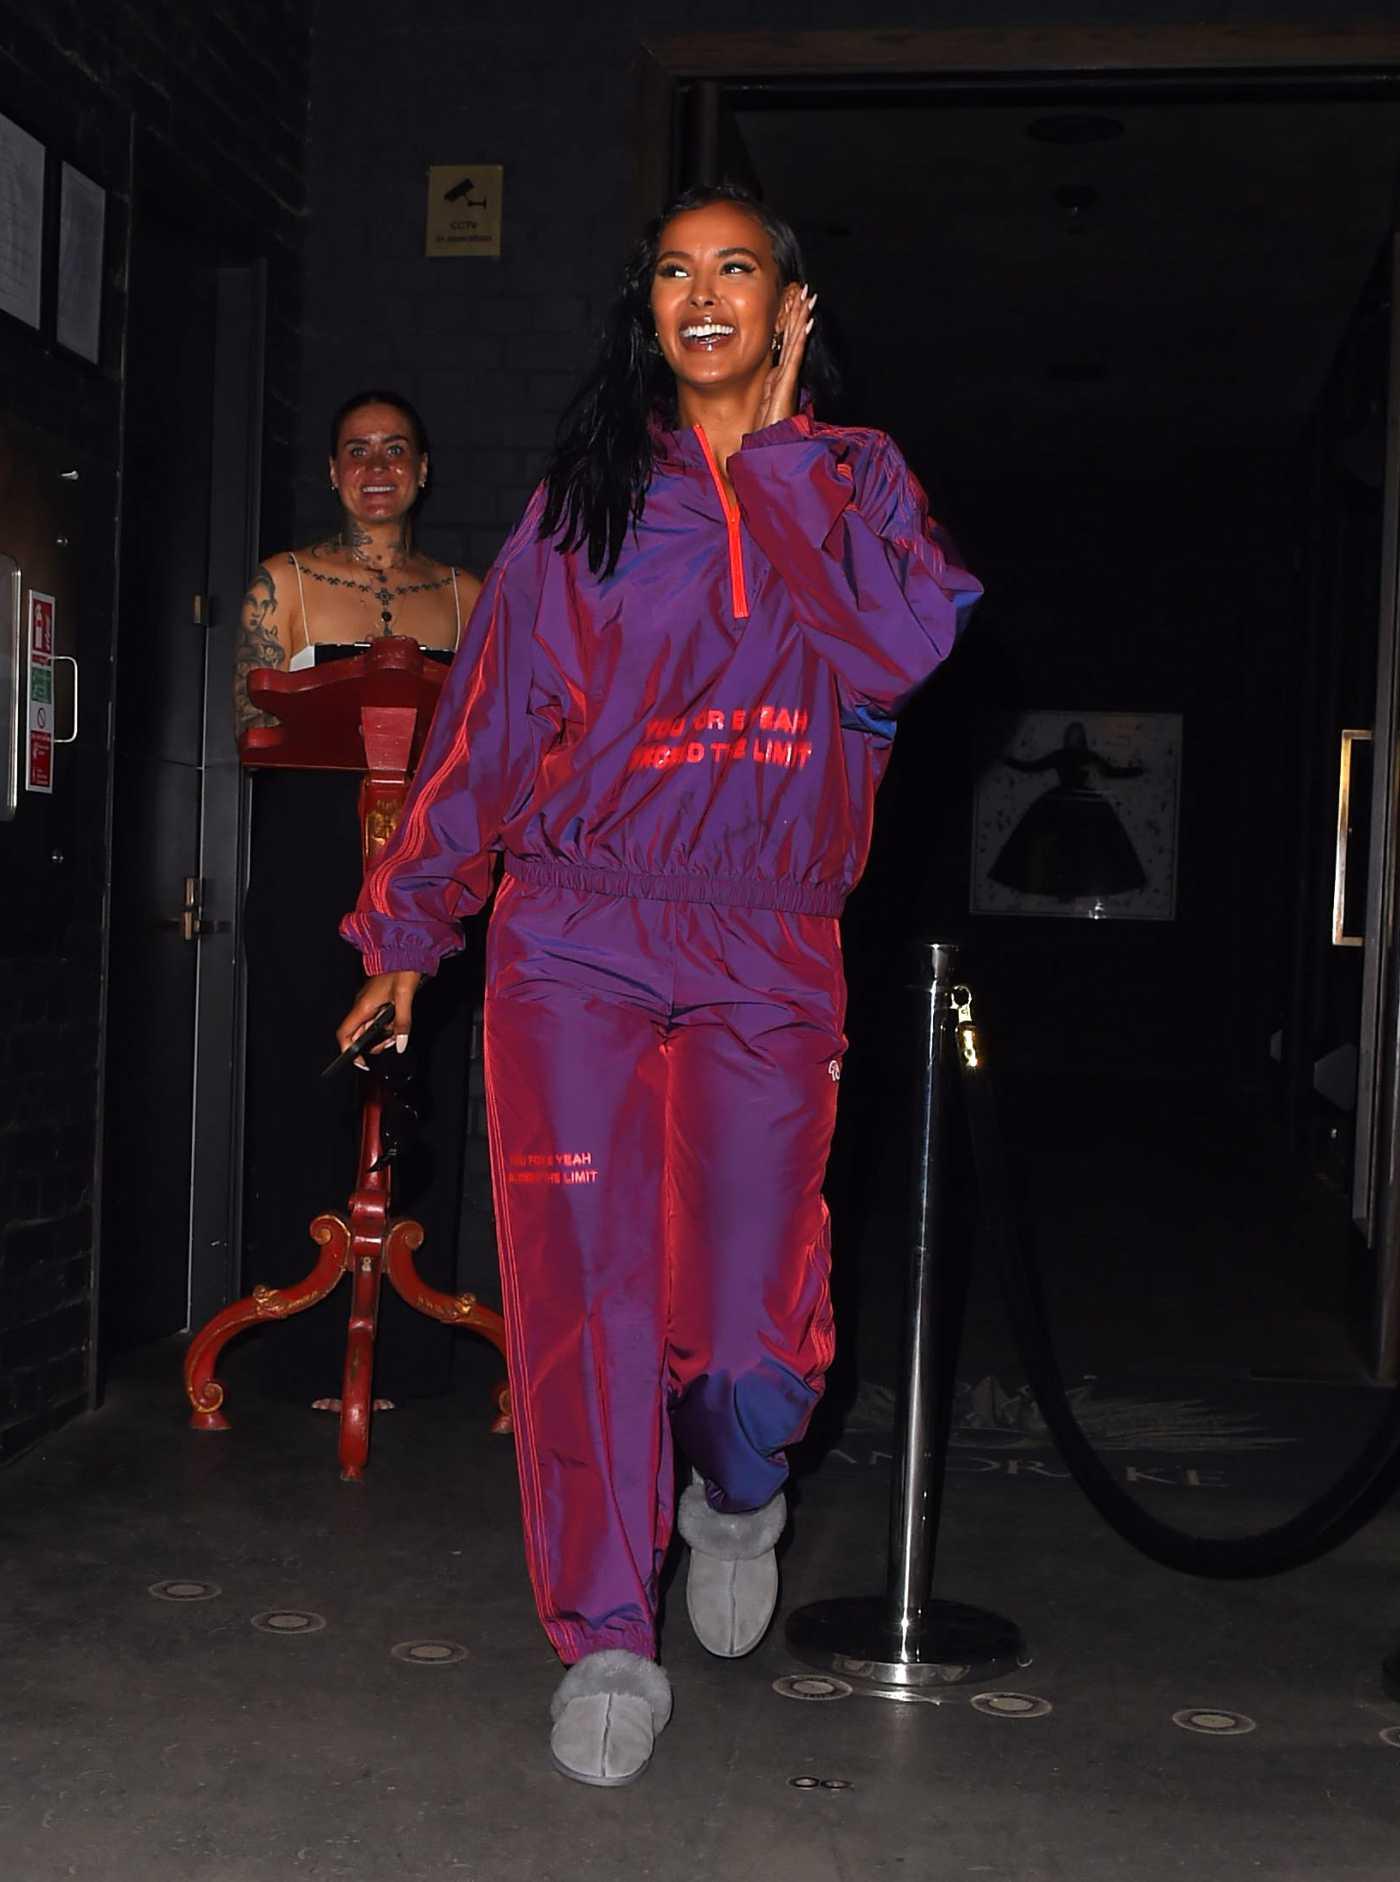 Maya Jama in a Purple Neon Metallic Tracksuit Was Seen Out in London 09/01/2020